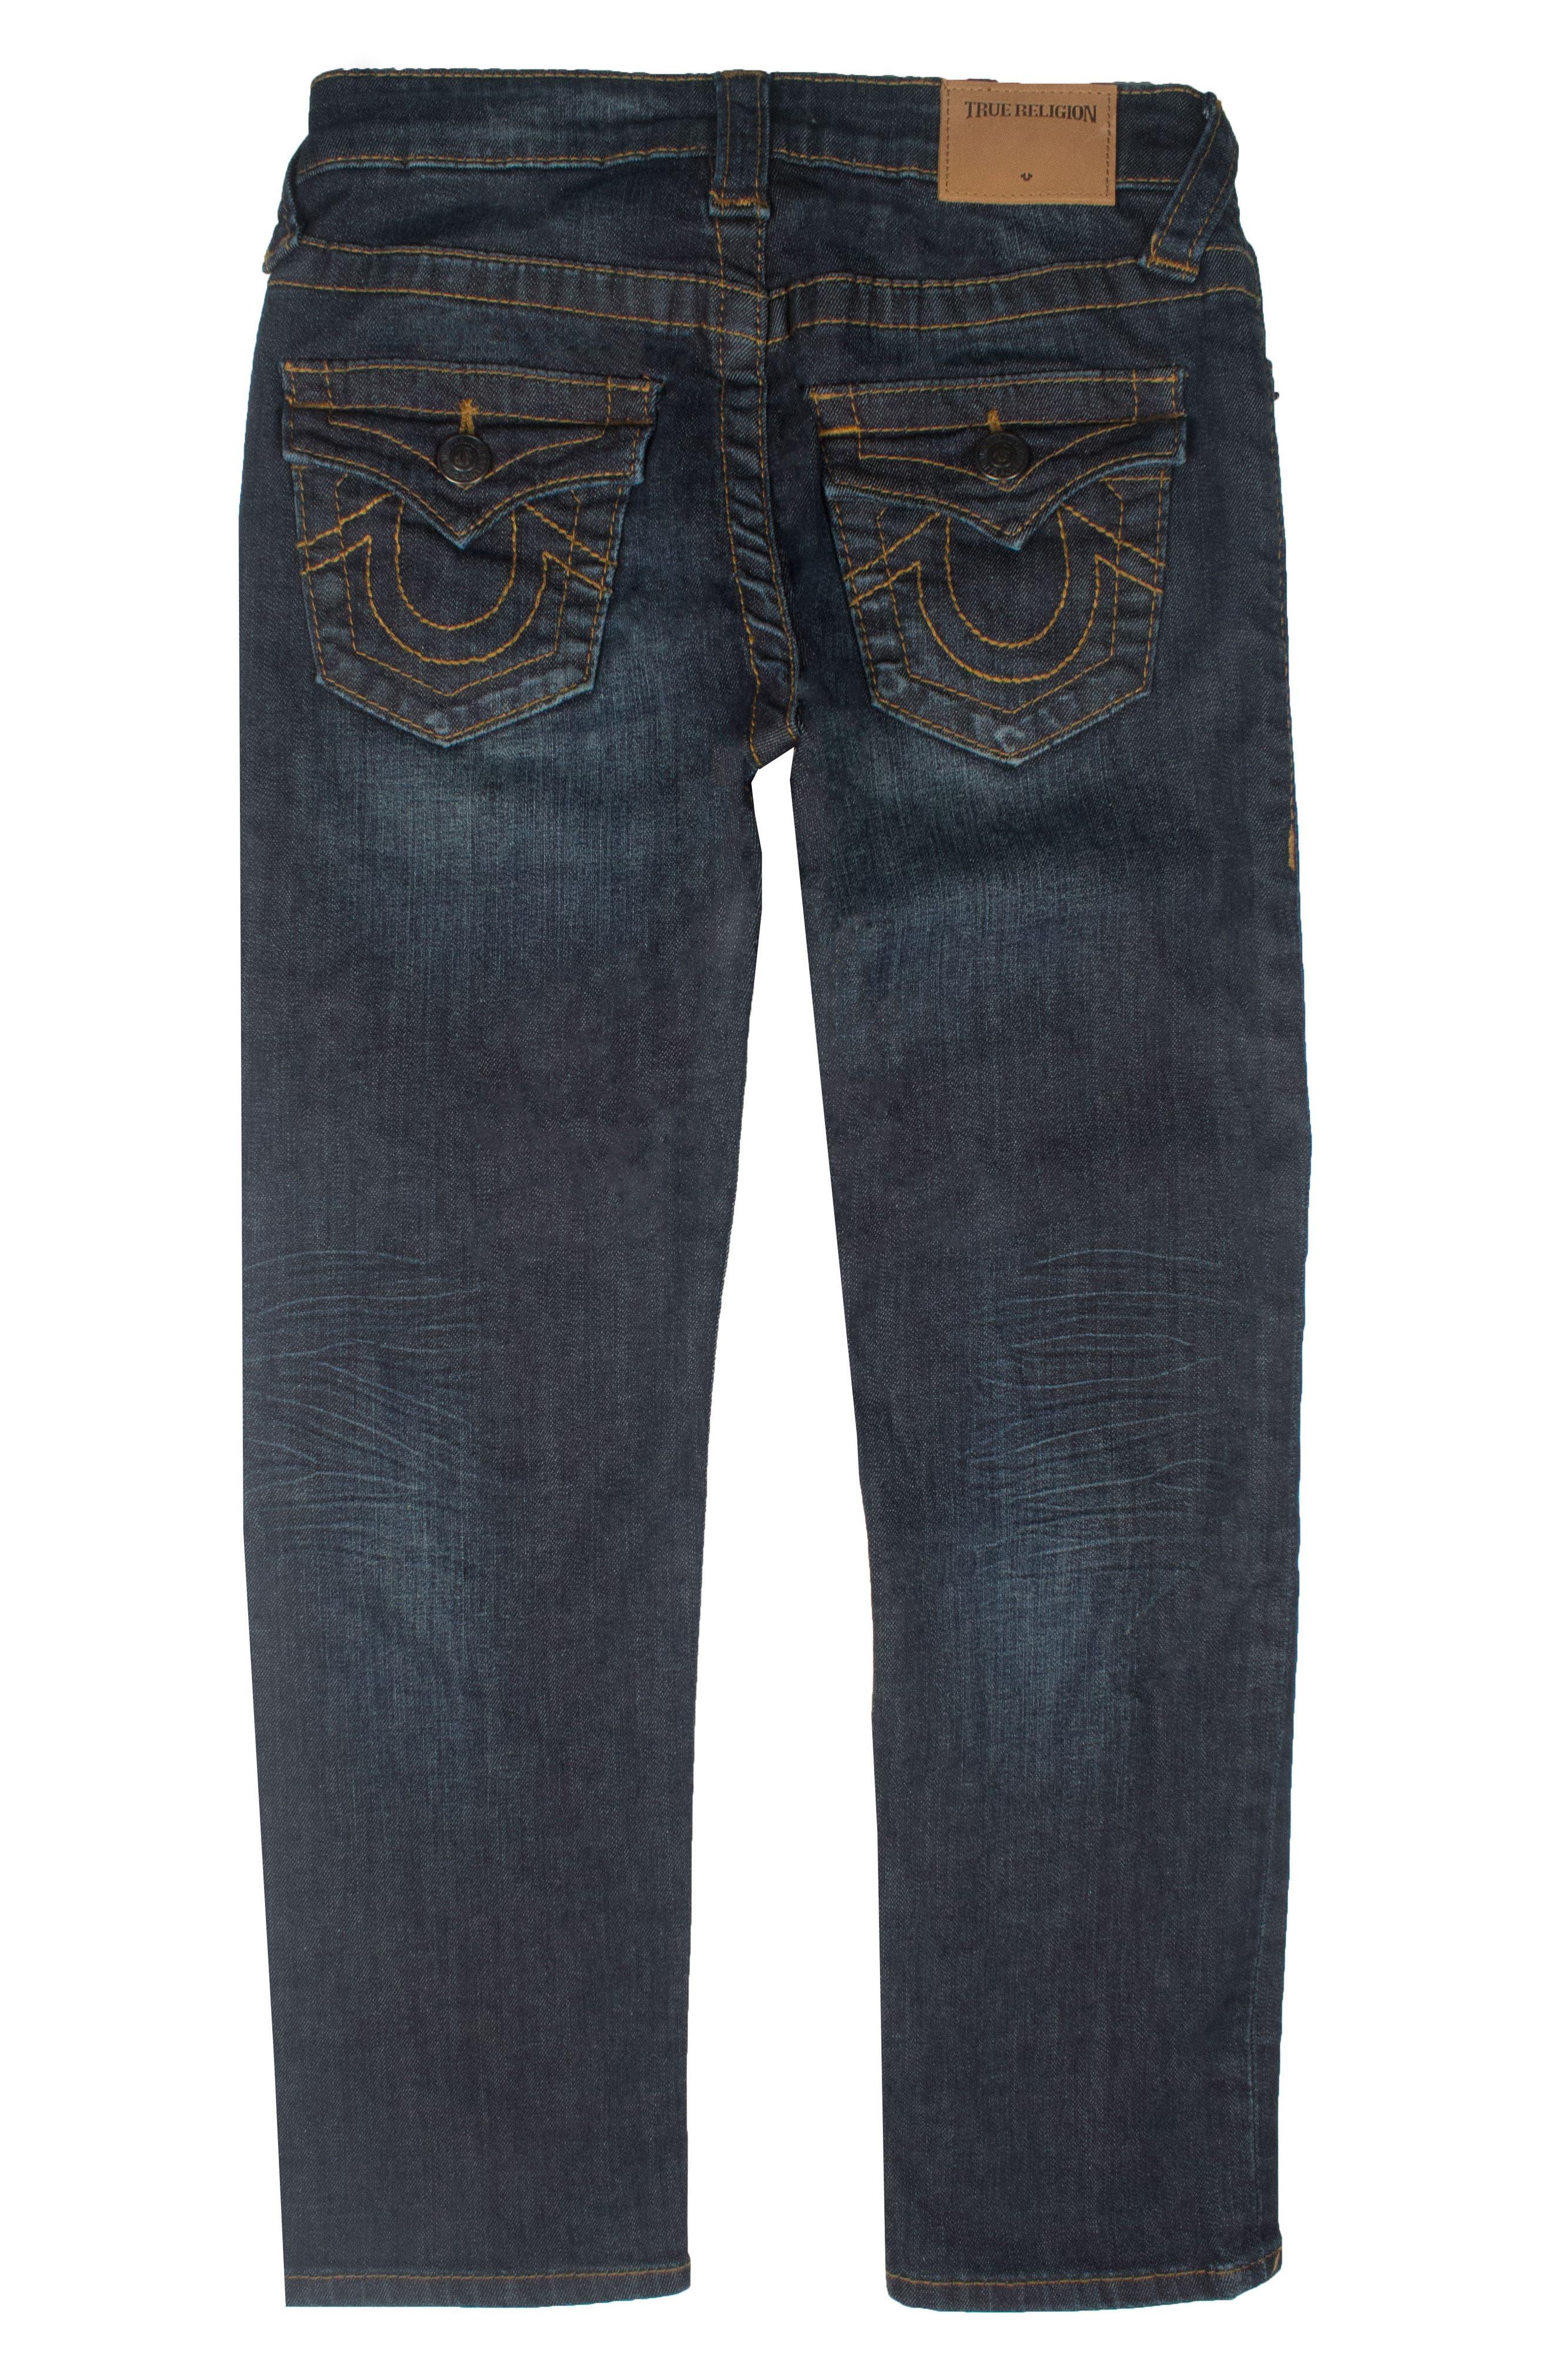 Geno Single End Straight Leg Jeans,                         Main,                         color, 473